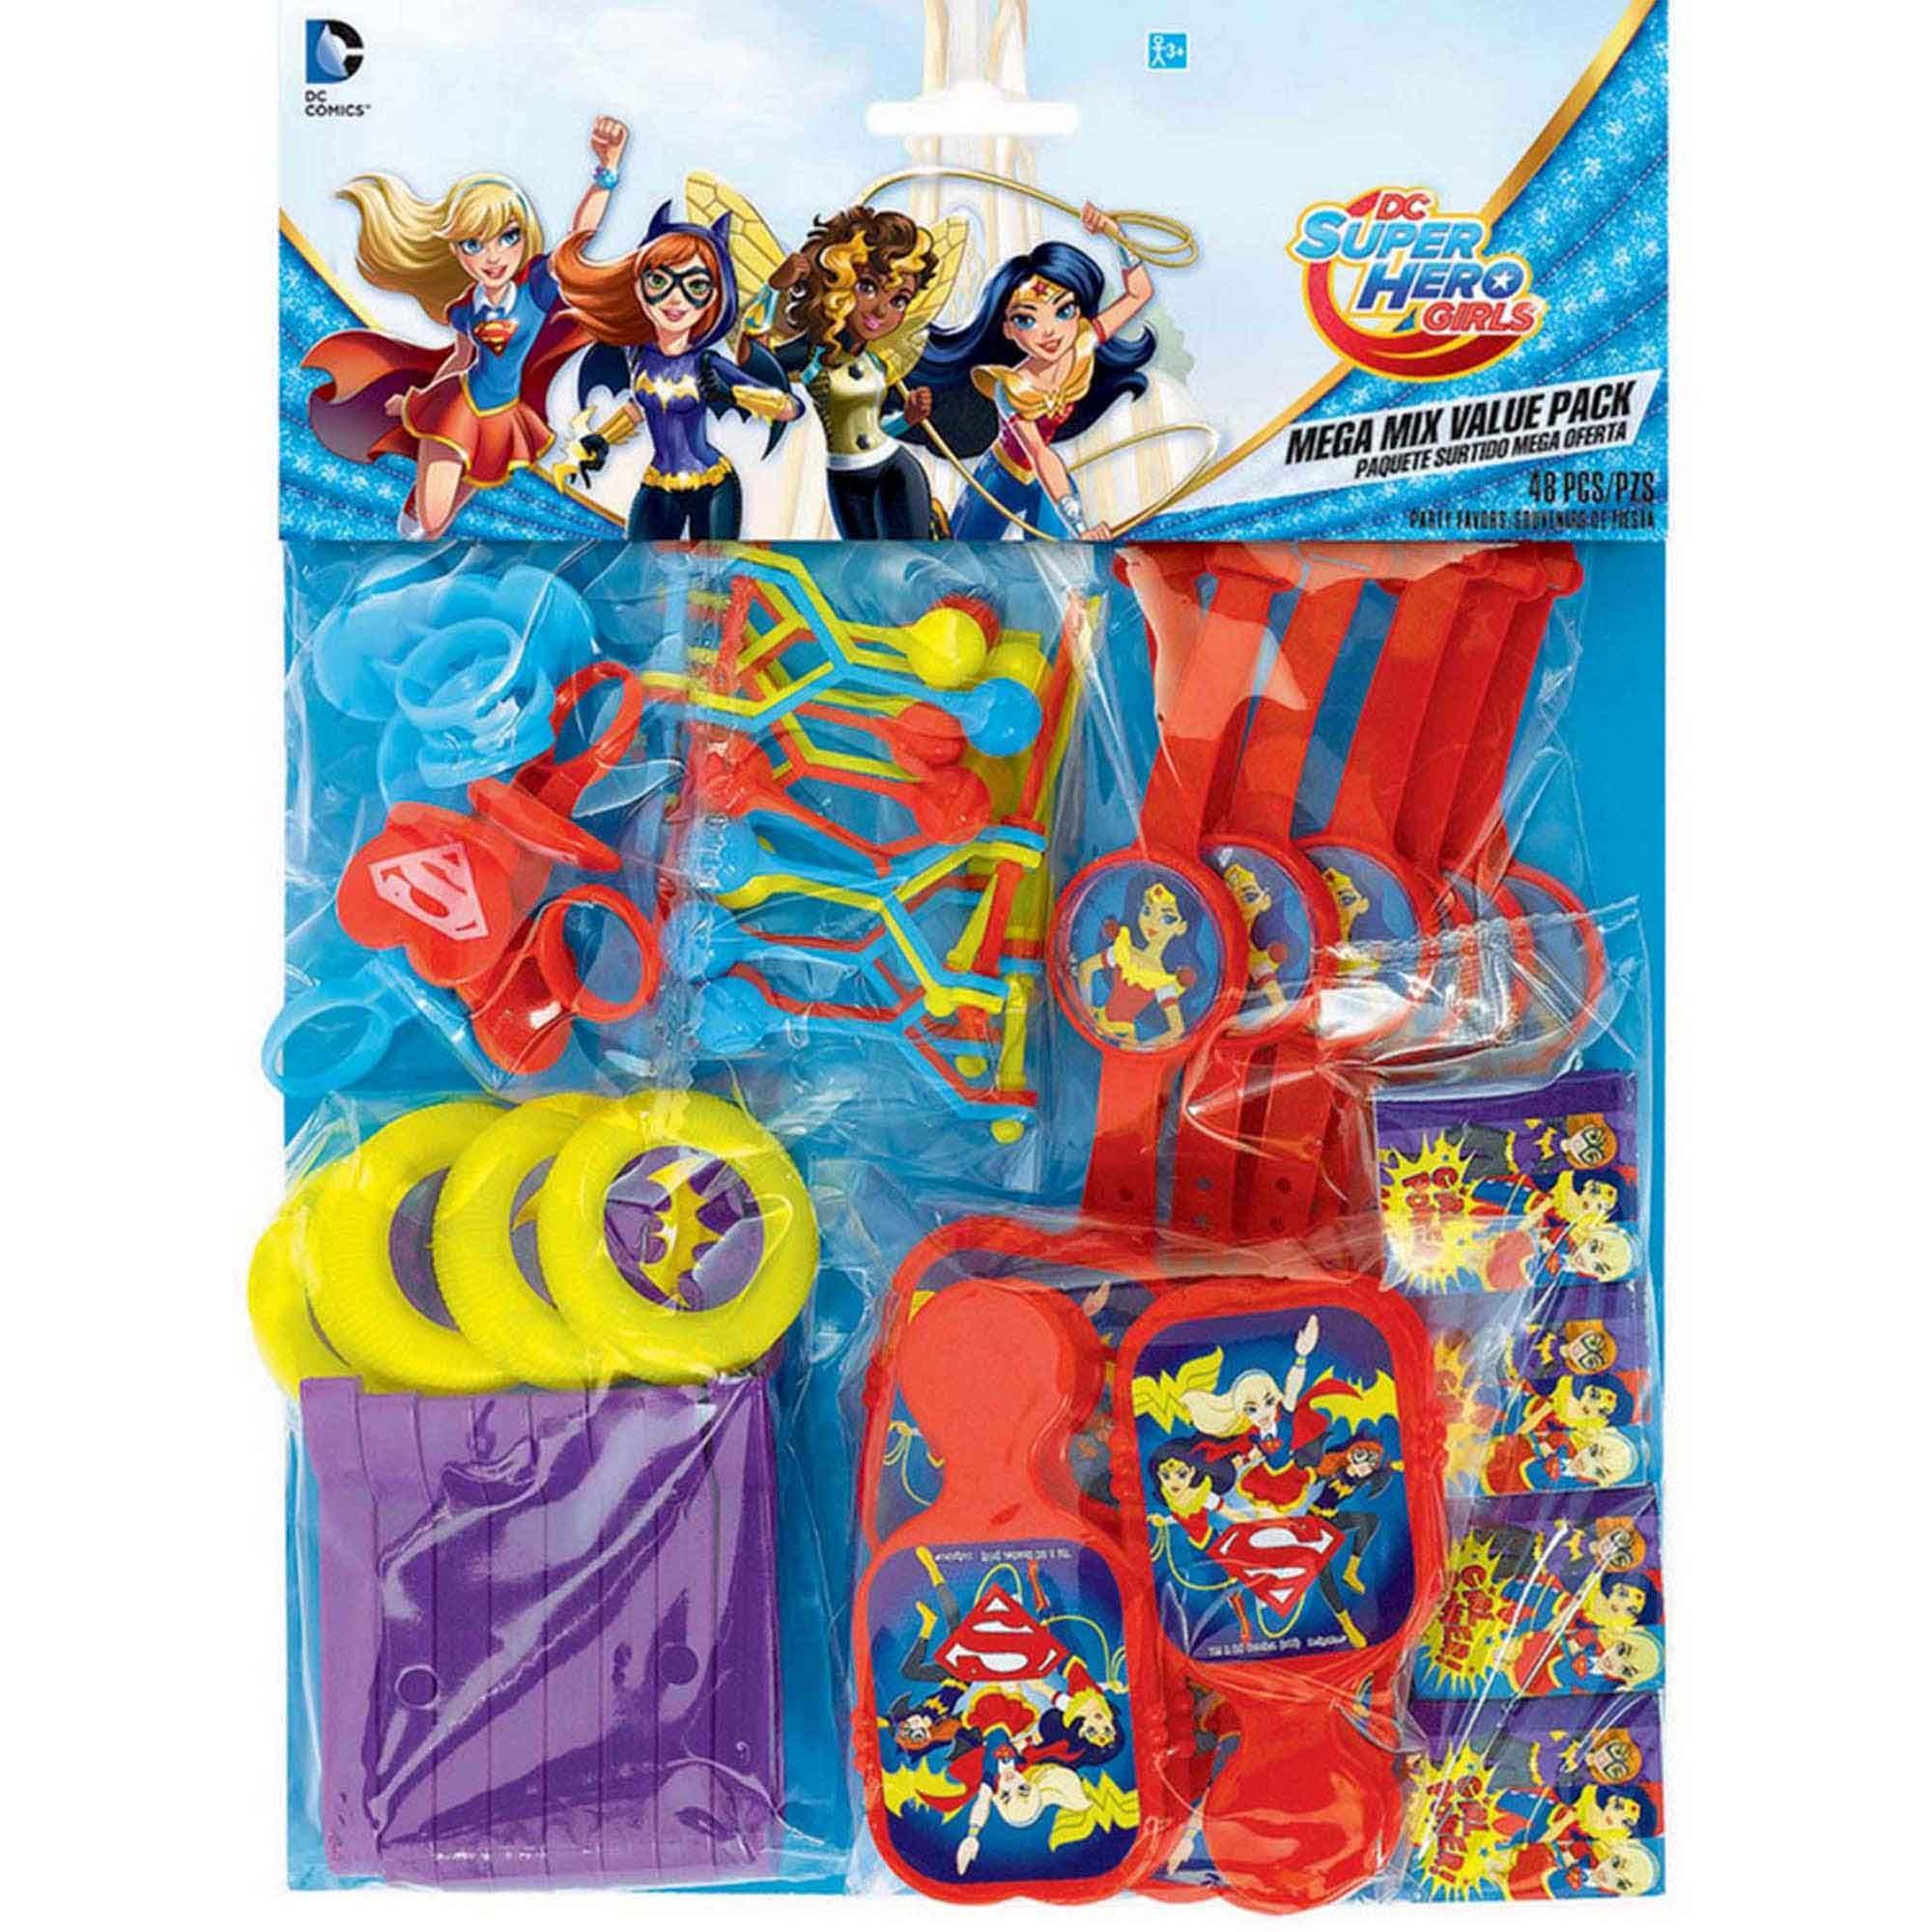 DC Superhero Girls Mega Mix Value Pack Favors